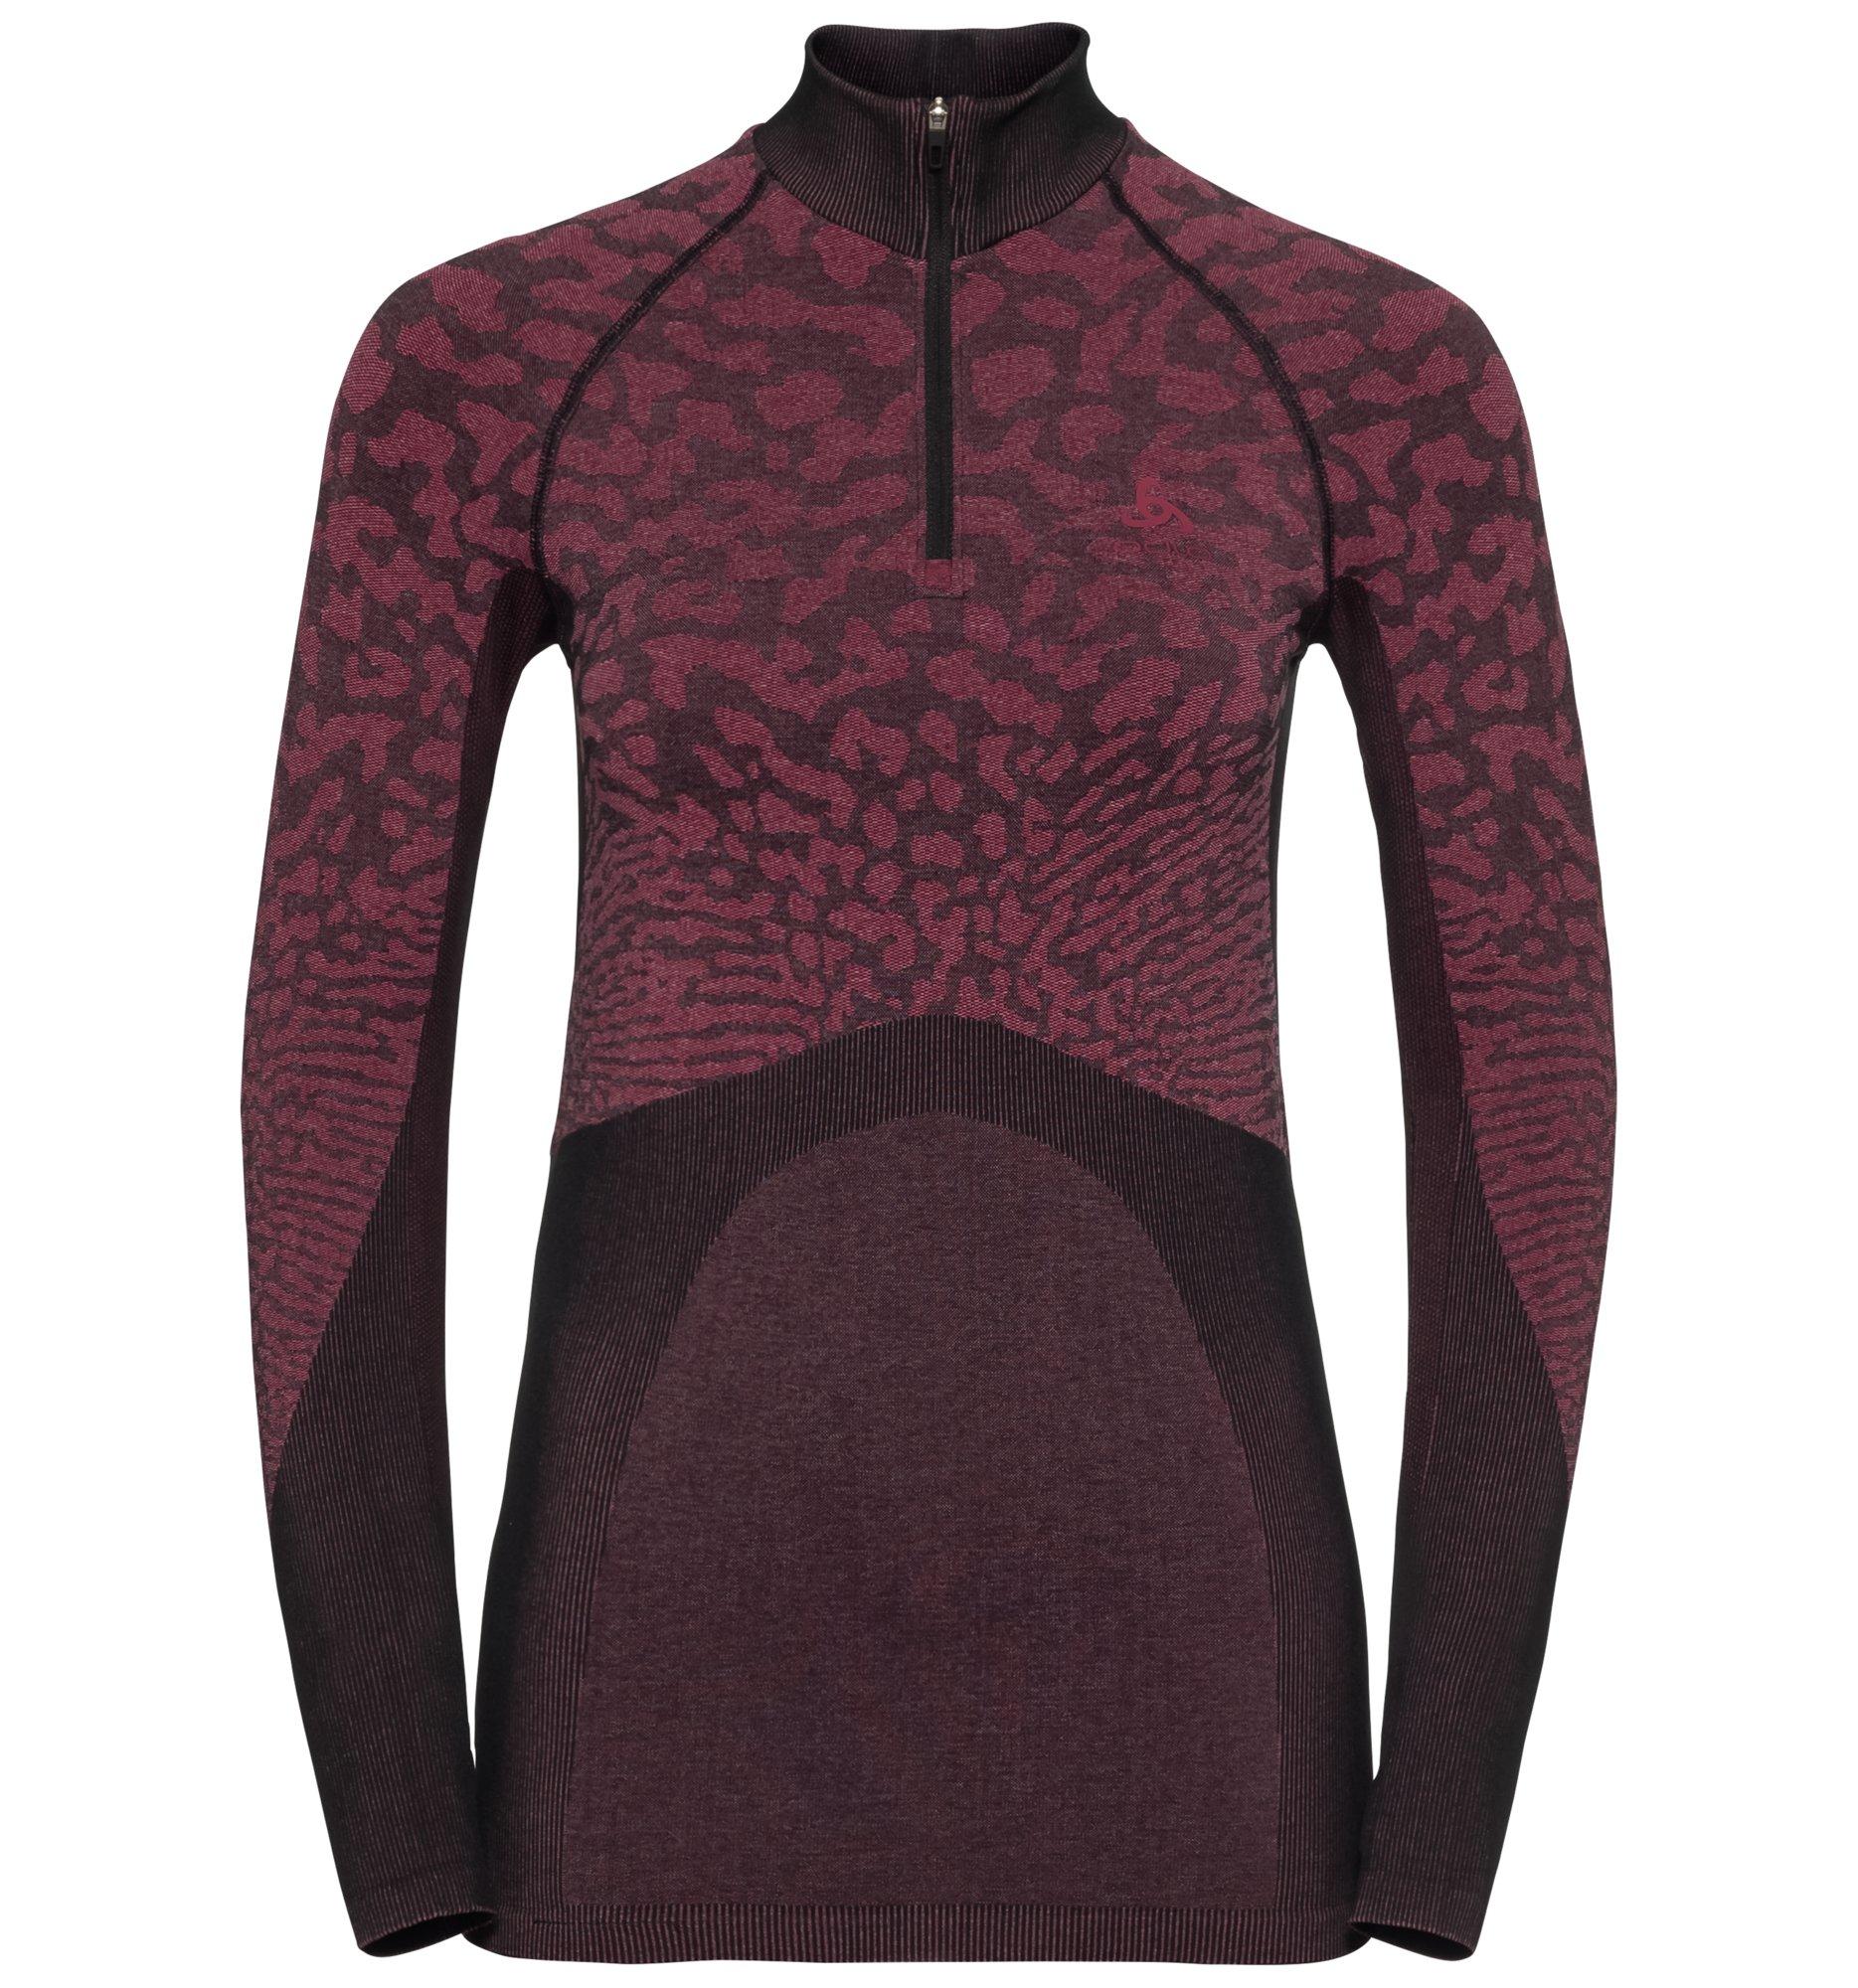 Odlo Damen BLACKCOMB Funktionsunterwäsche Langarm-Shirt mit 1/2 Reißverschluss & Stehkragen - cerise